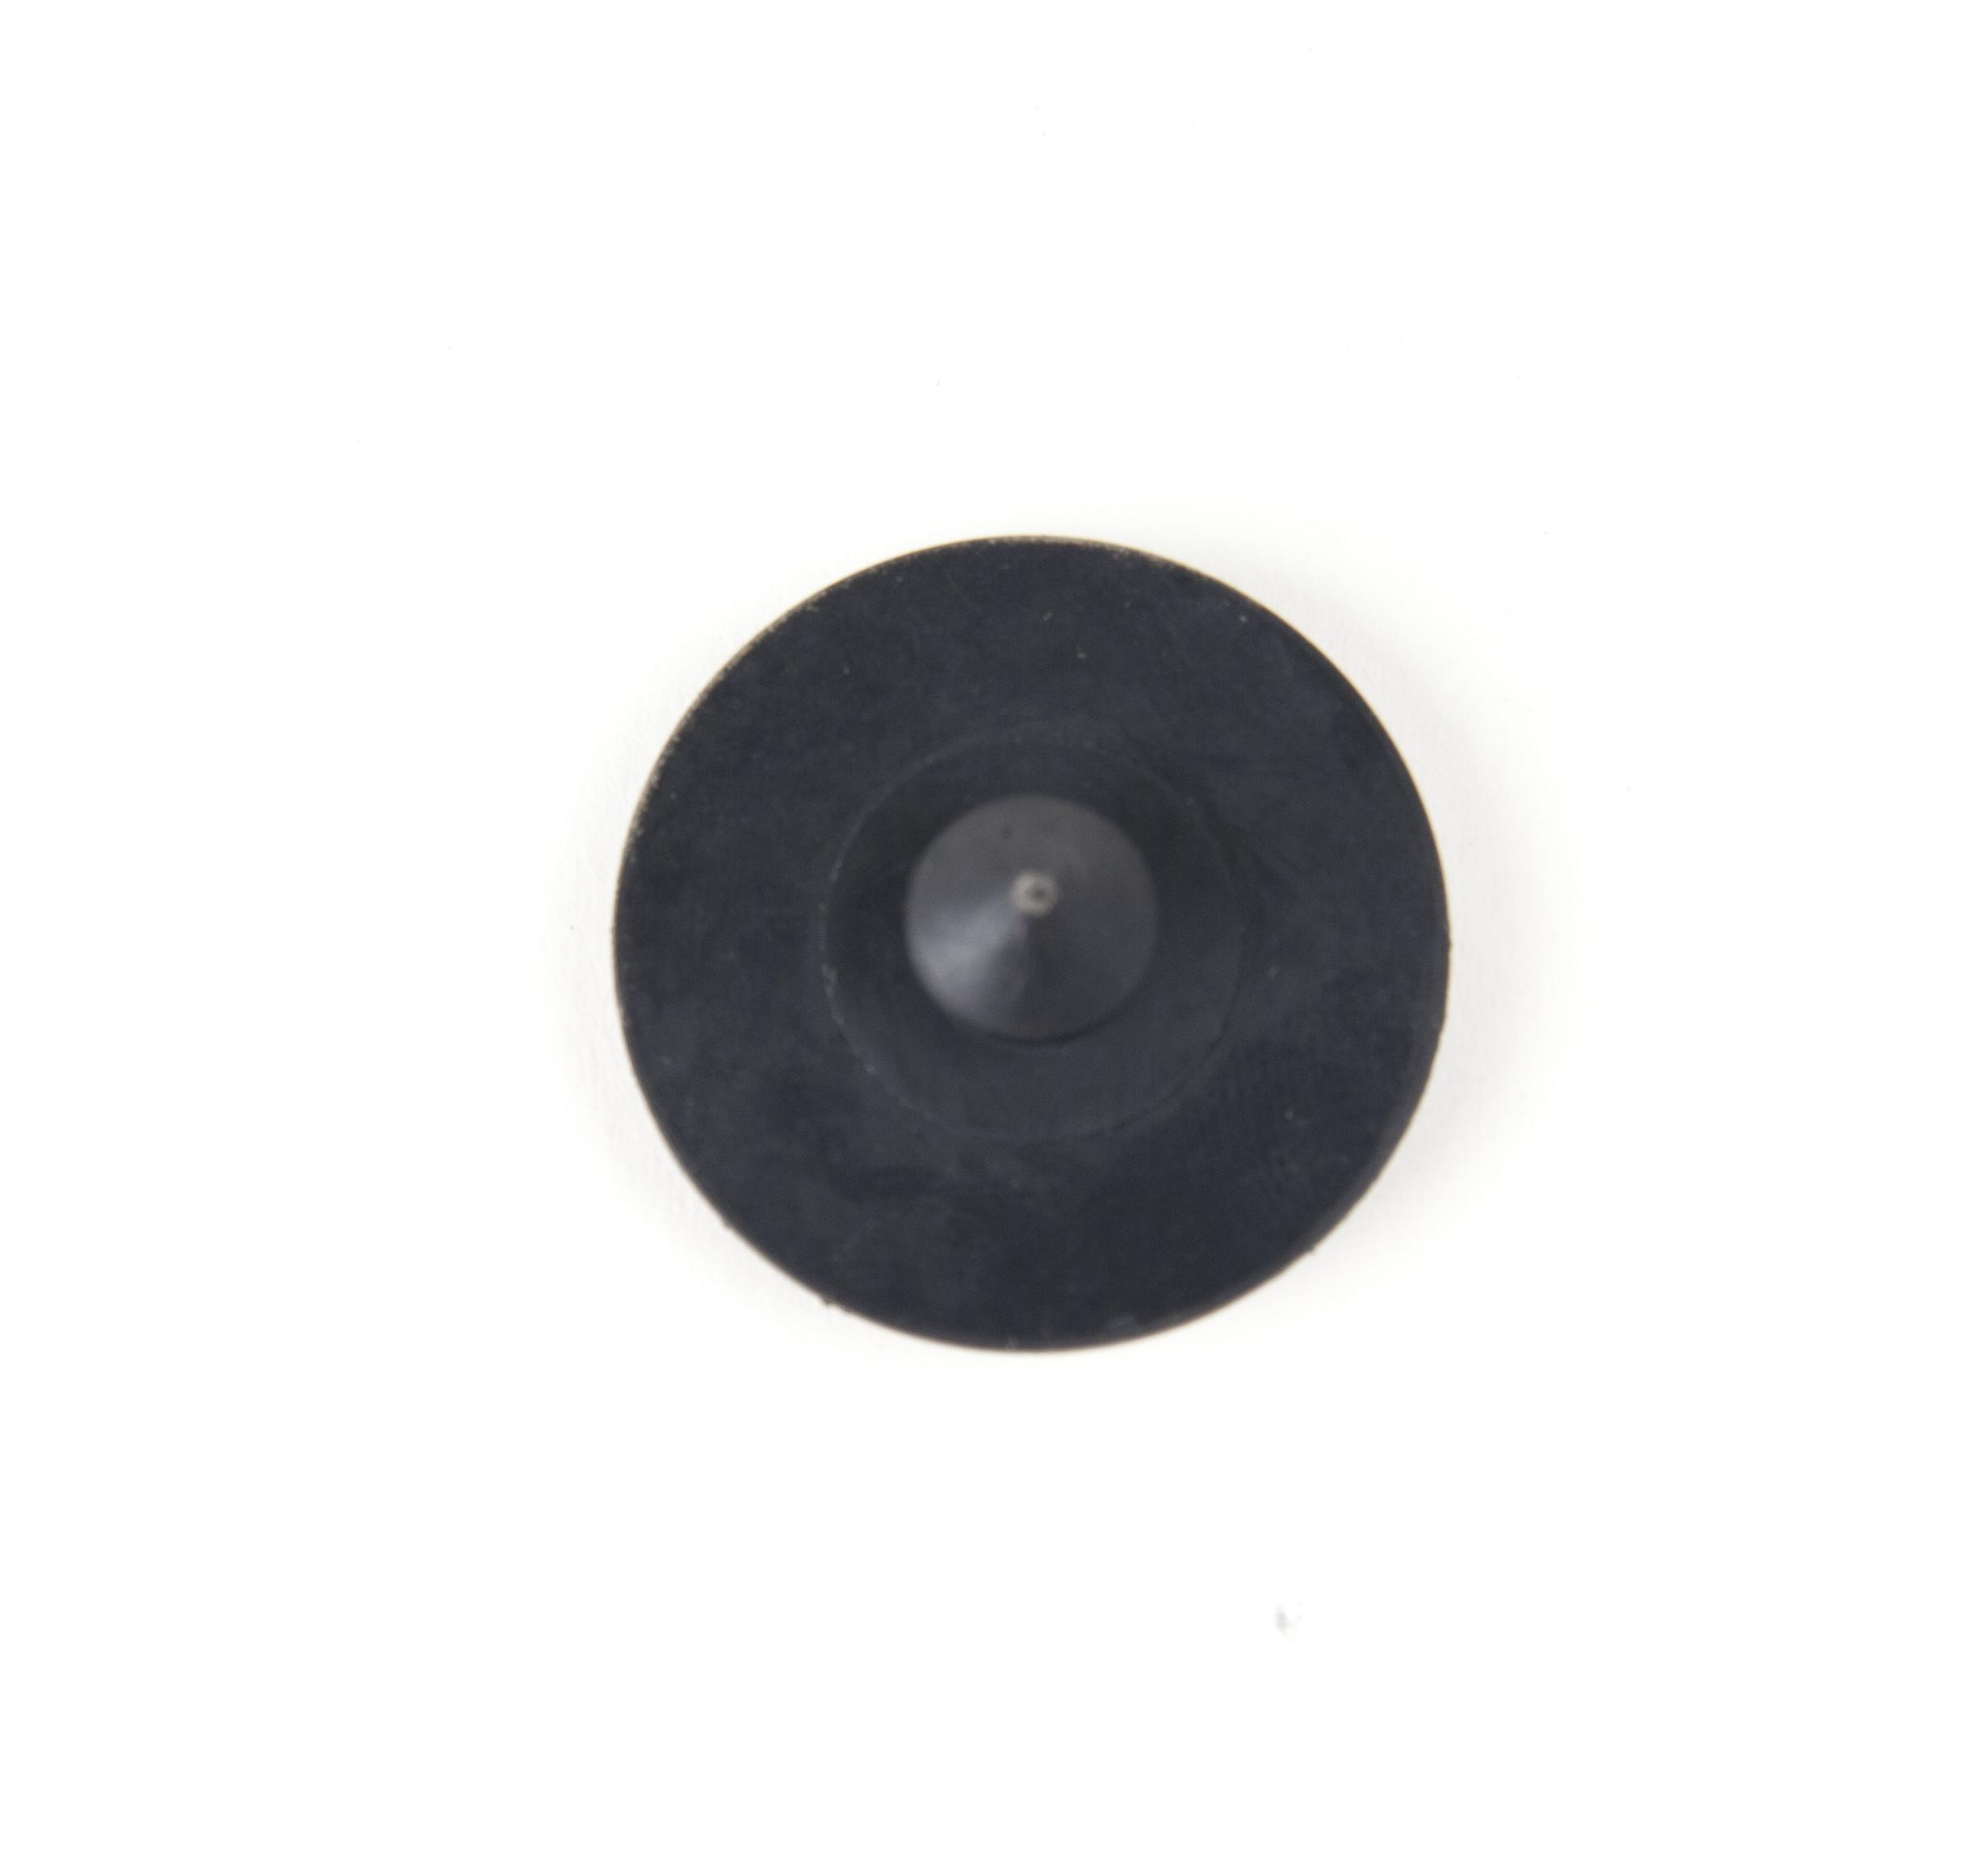 Stainless Steel Sprayer Rubber Valve 30362